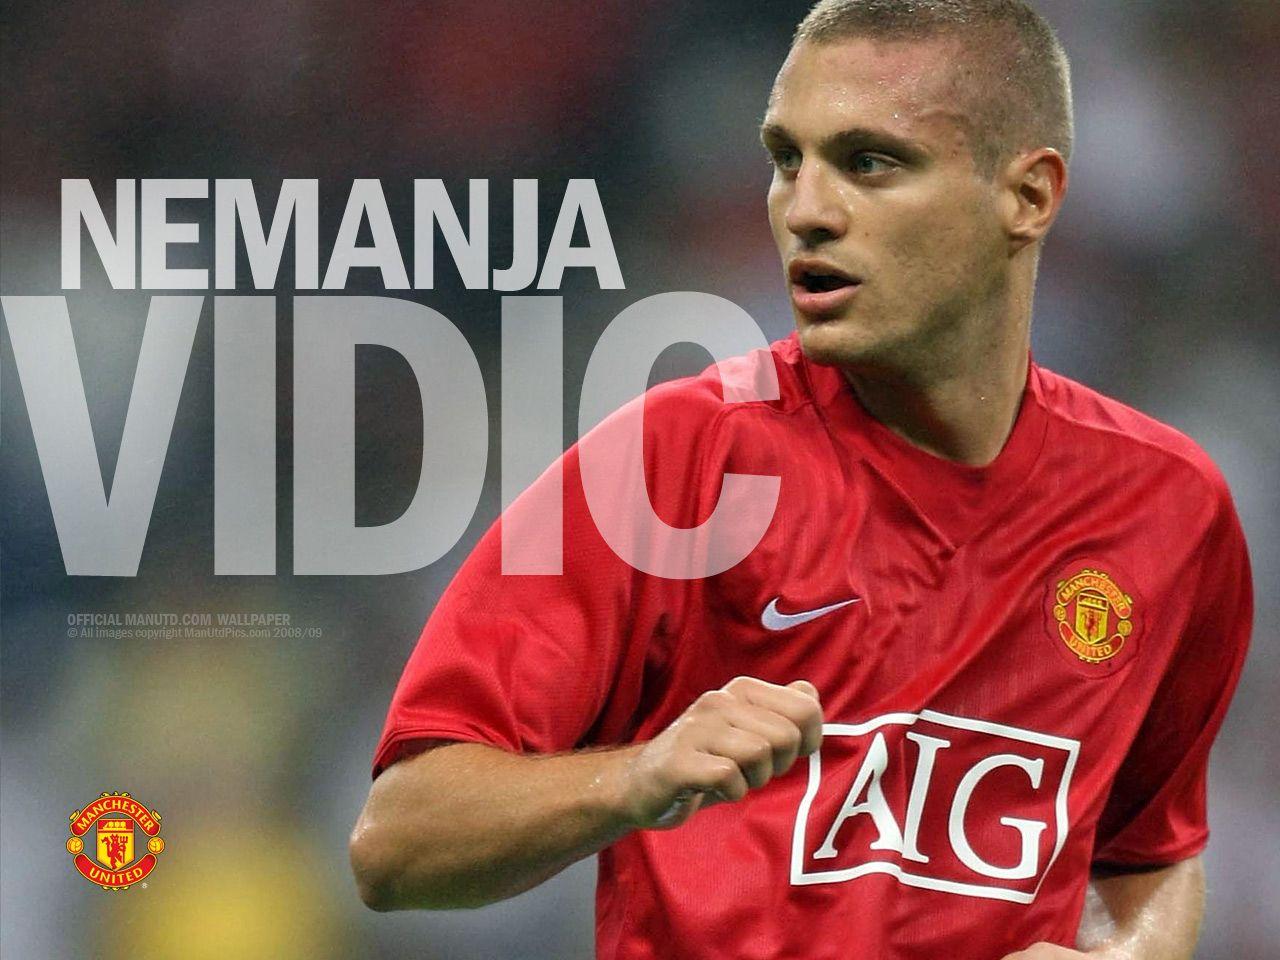 Nemanja Vidic - Picture